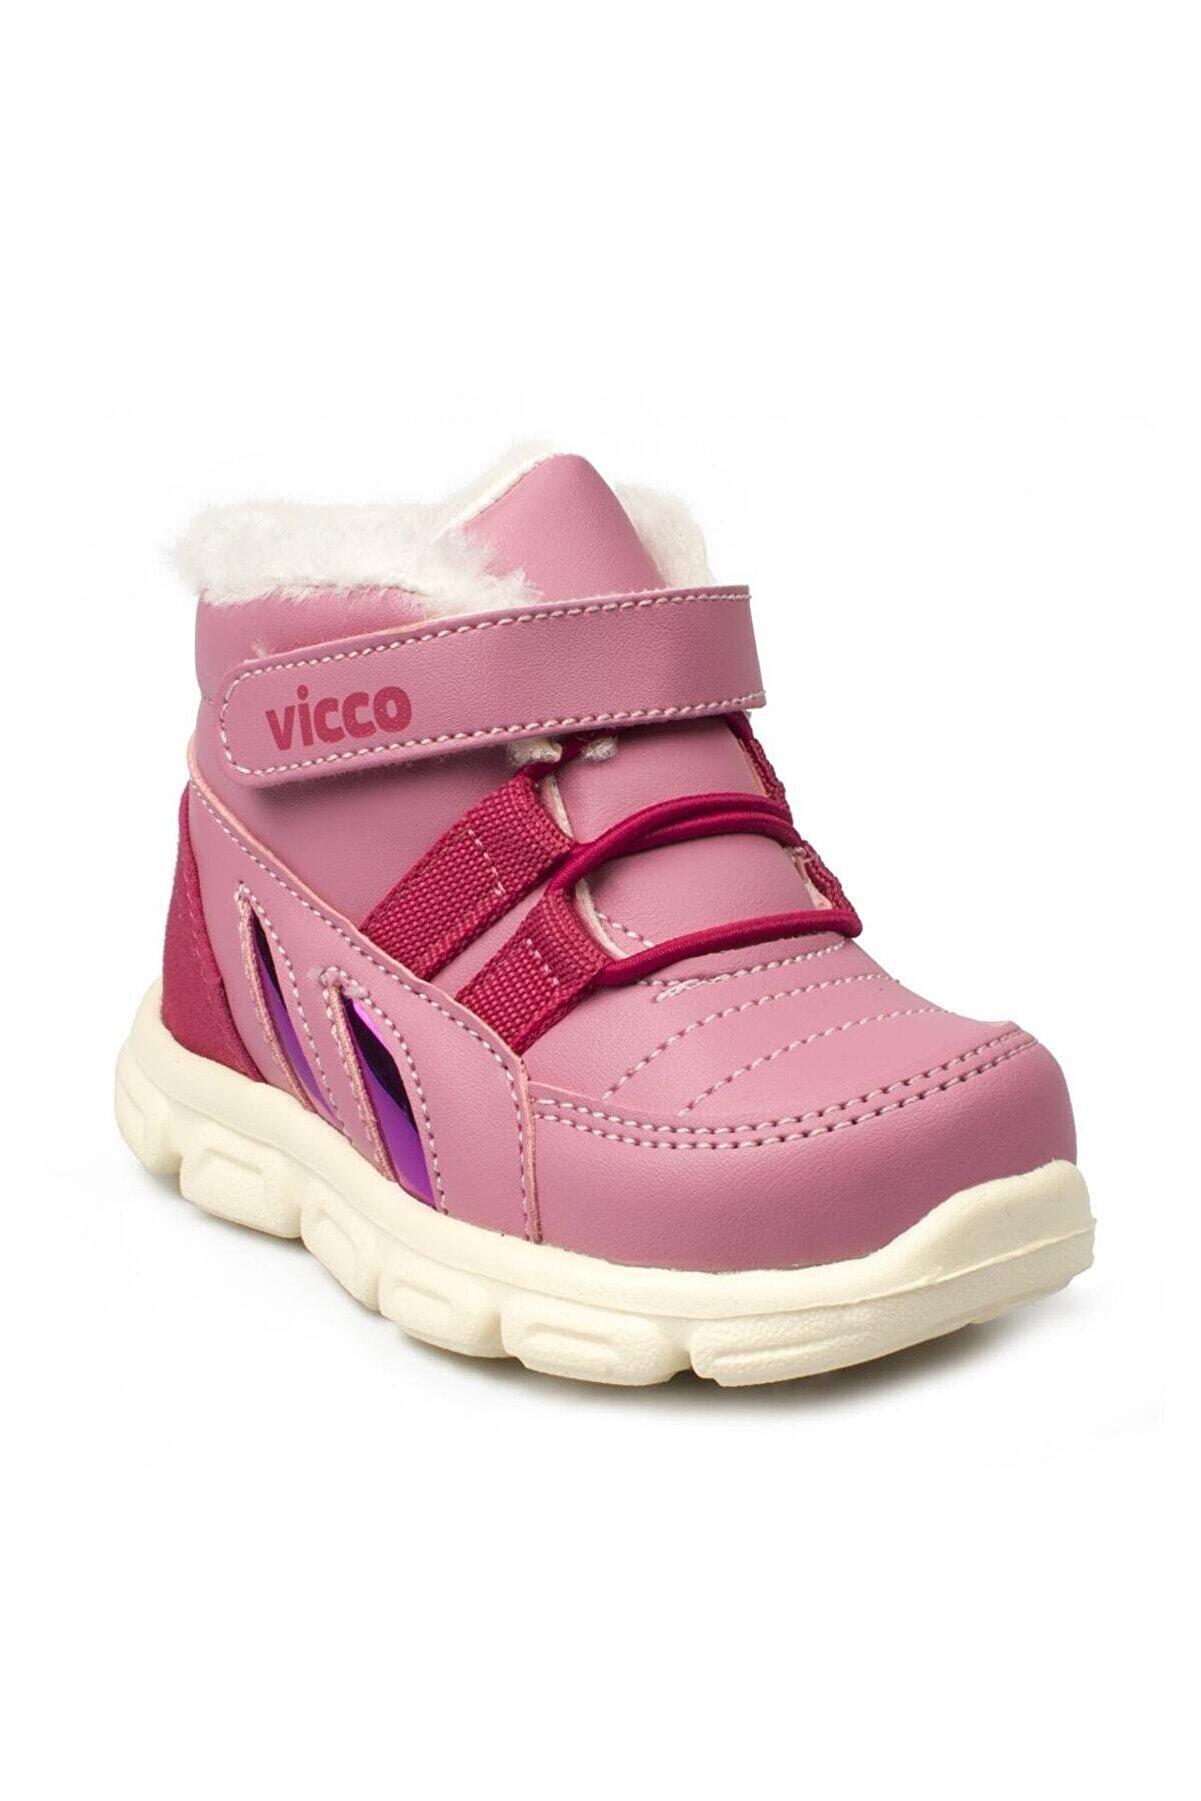 Vicco 946.b19k.257 Pembe (22-25) Çocuk Ayakkabı Bot